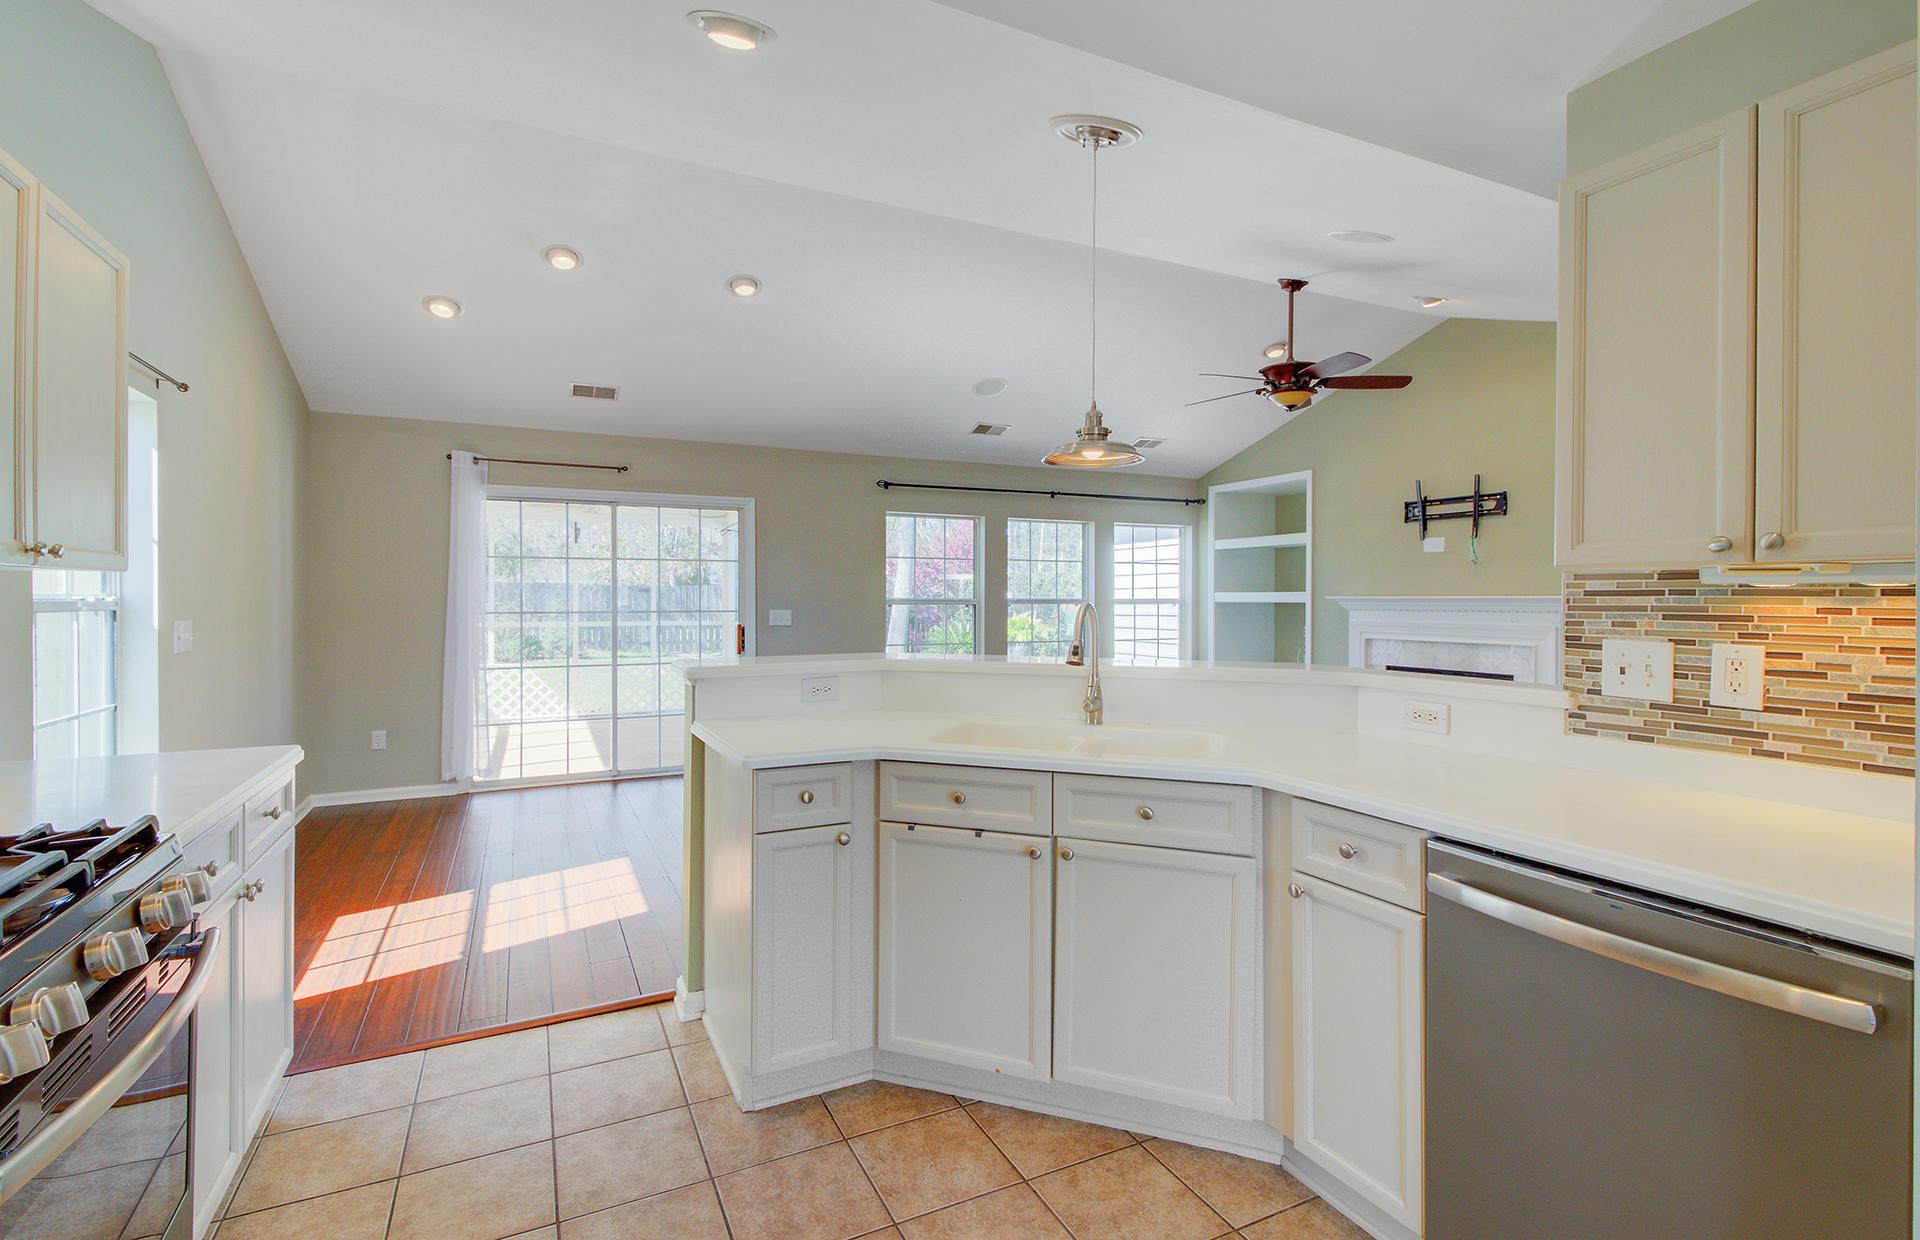 Grand Oaks Plantation Homes For Sale - 789 Bent Hickory, Charleston, SC - 12